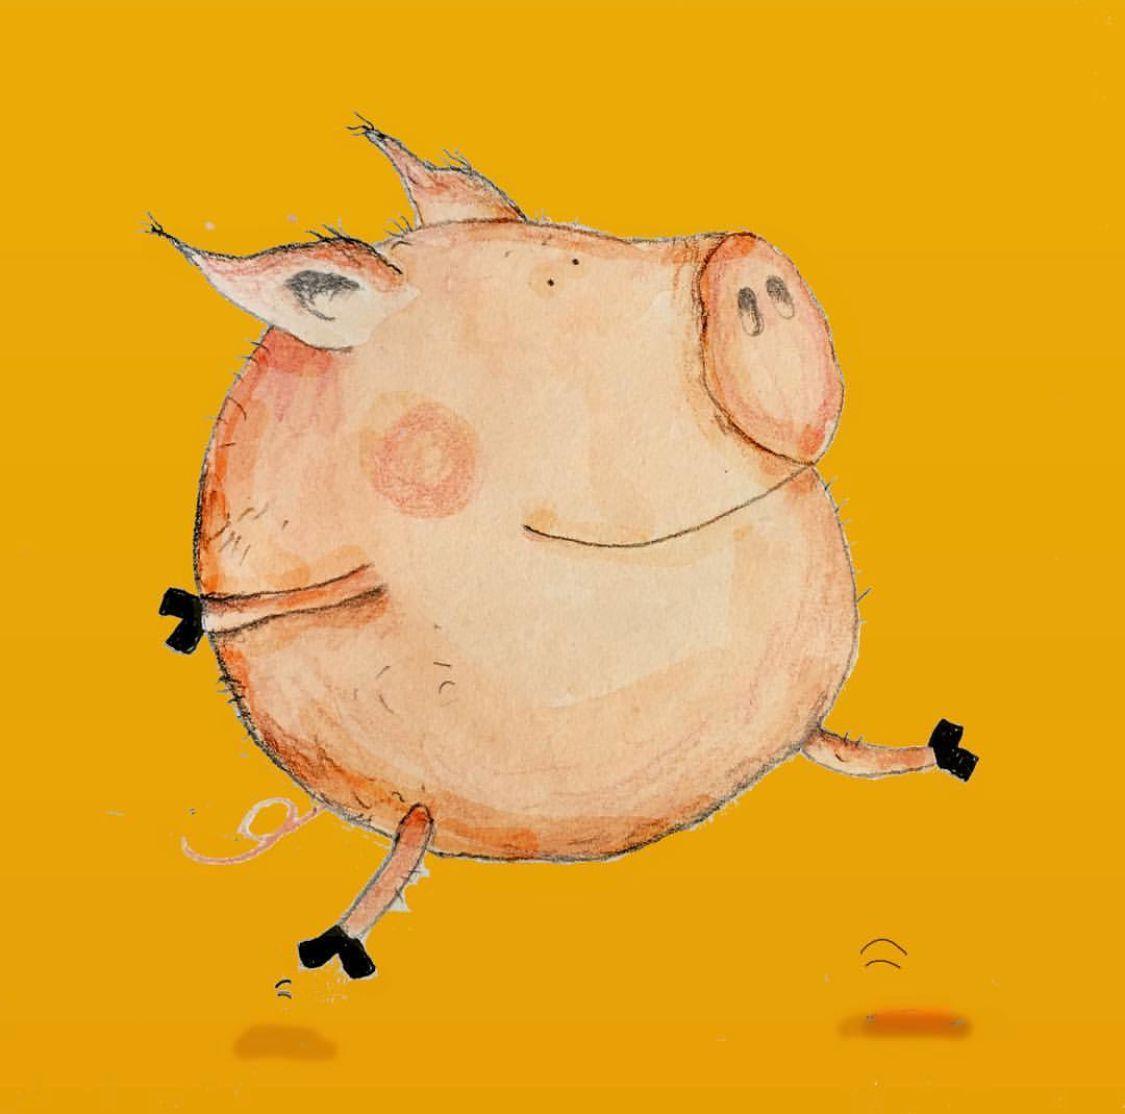 Pin od Eliza na inspiracje Pinterest Pig art Art i Flying pig